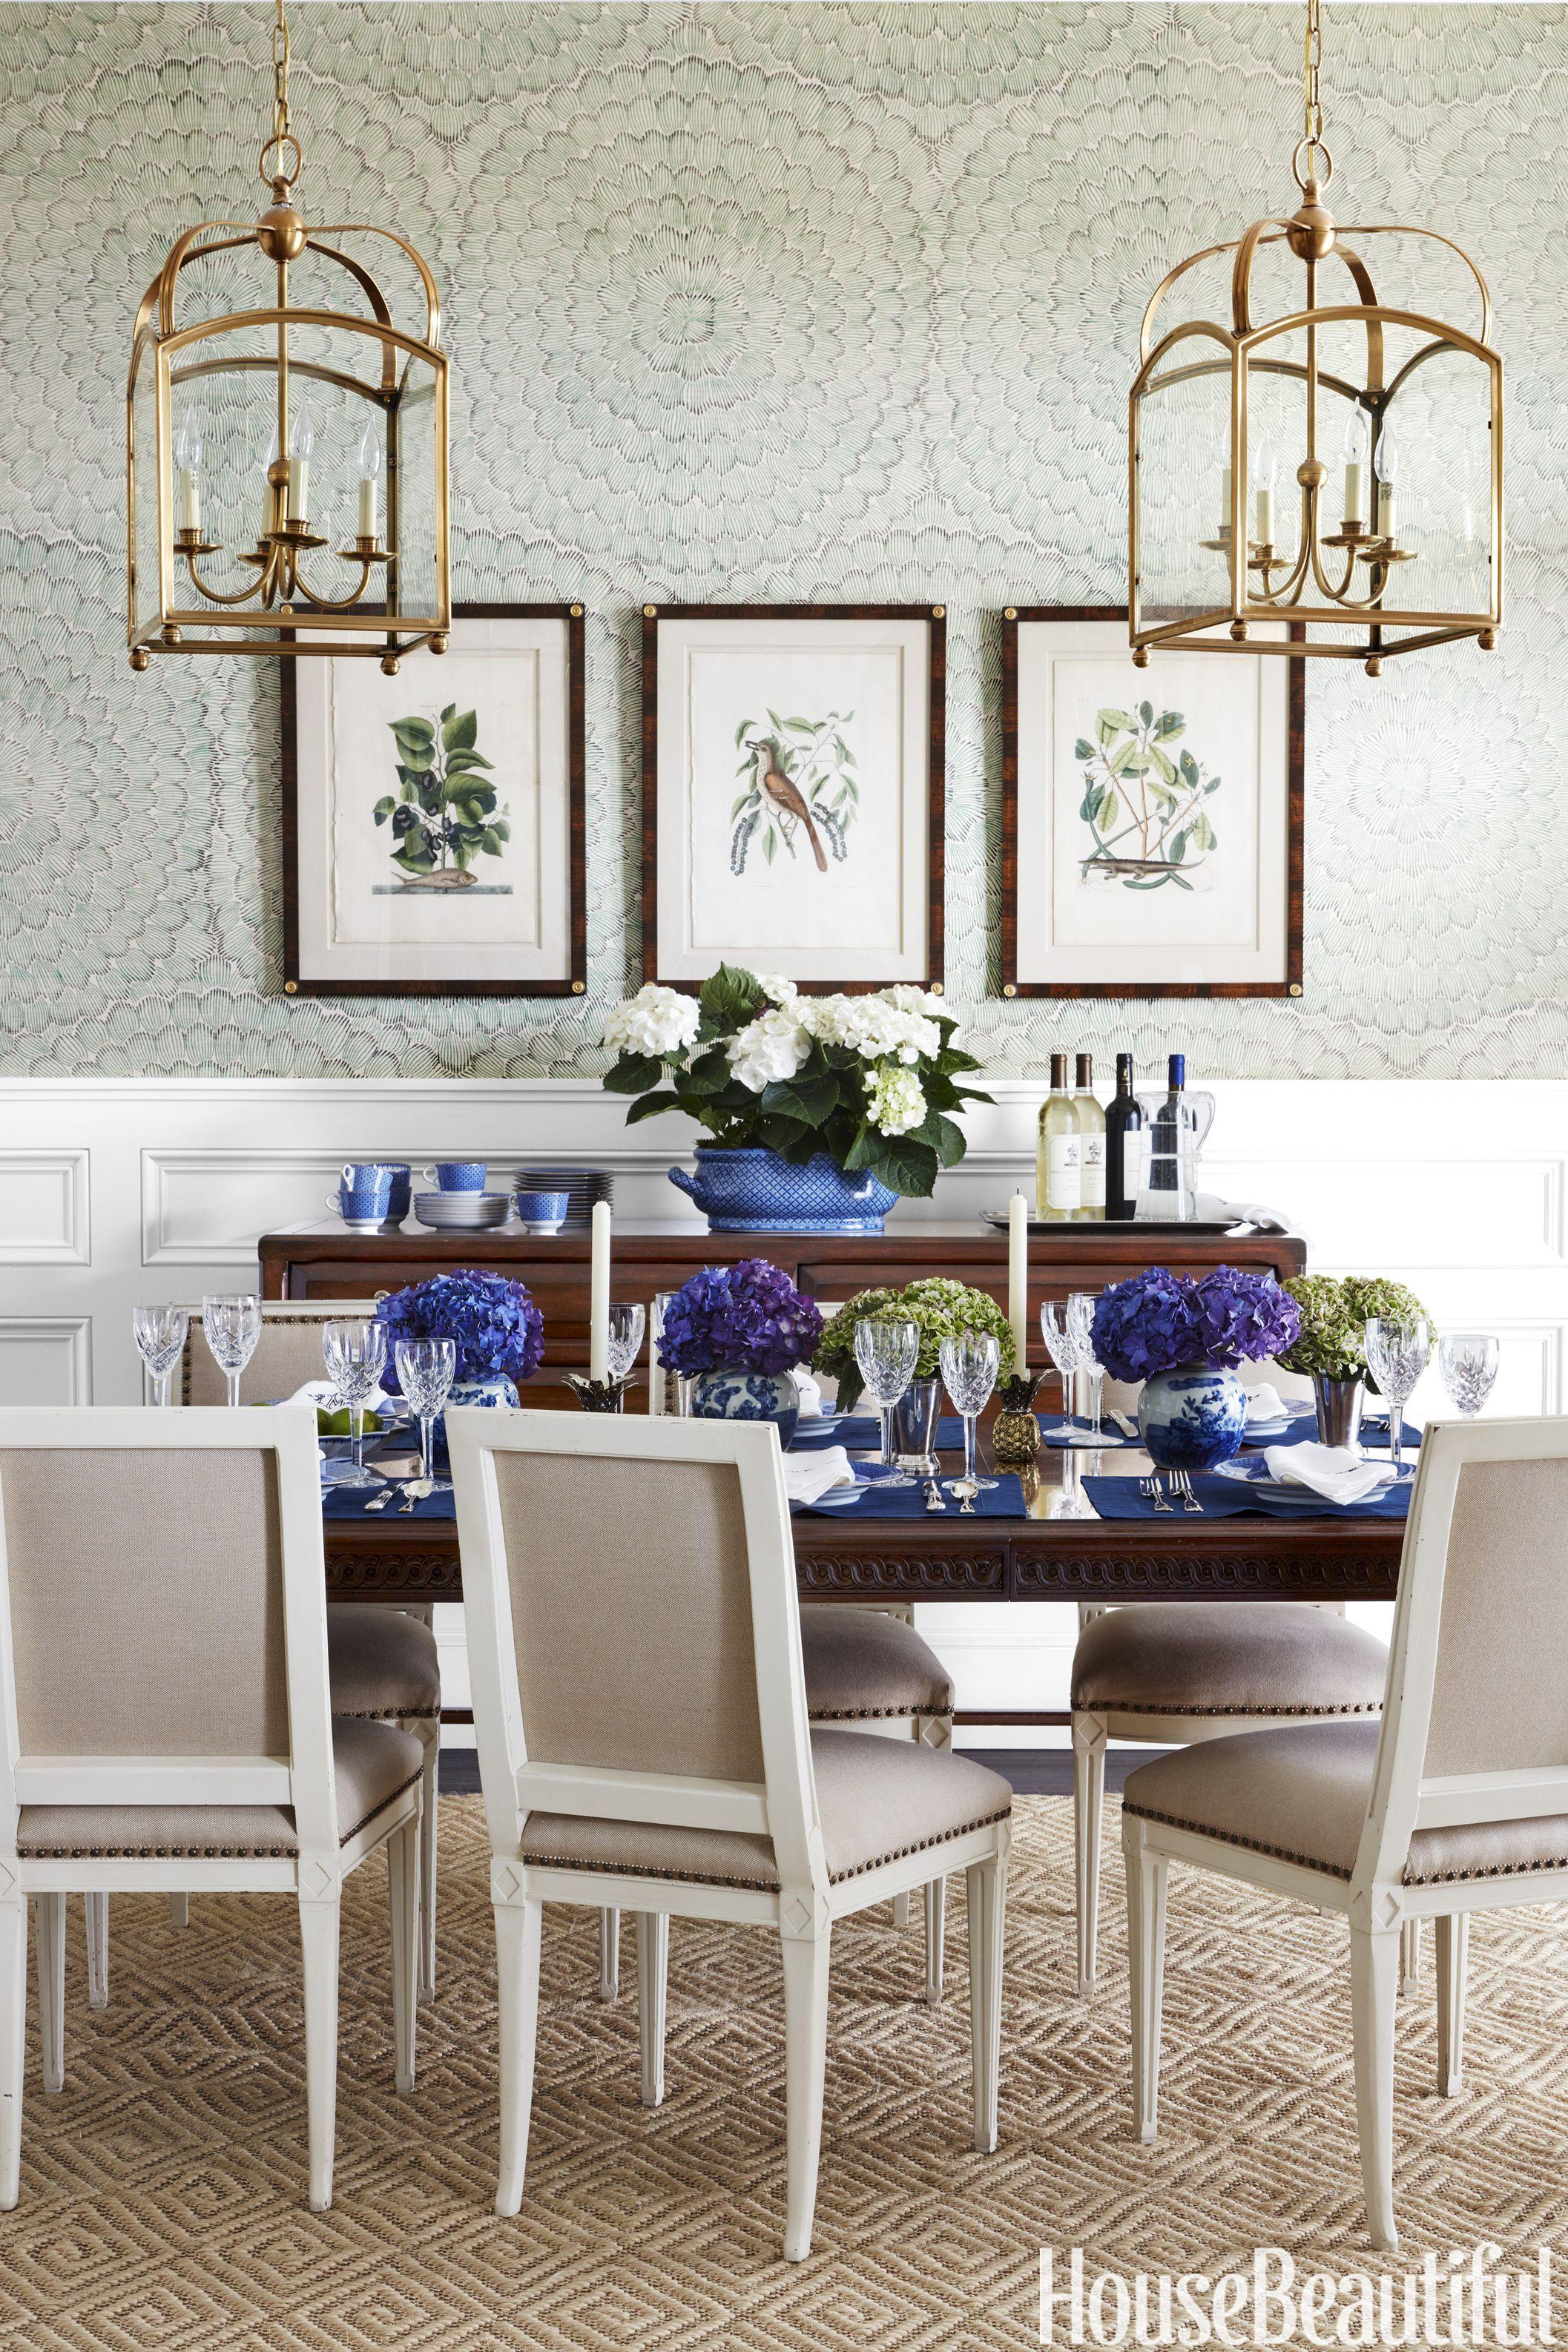 15 Rustic Dining Room Ideas Best, Rustic Dining Room